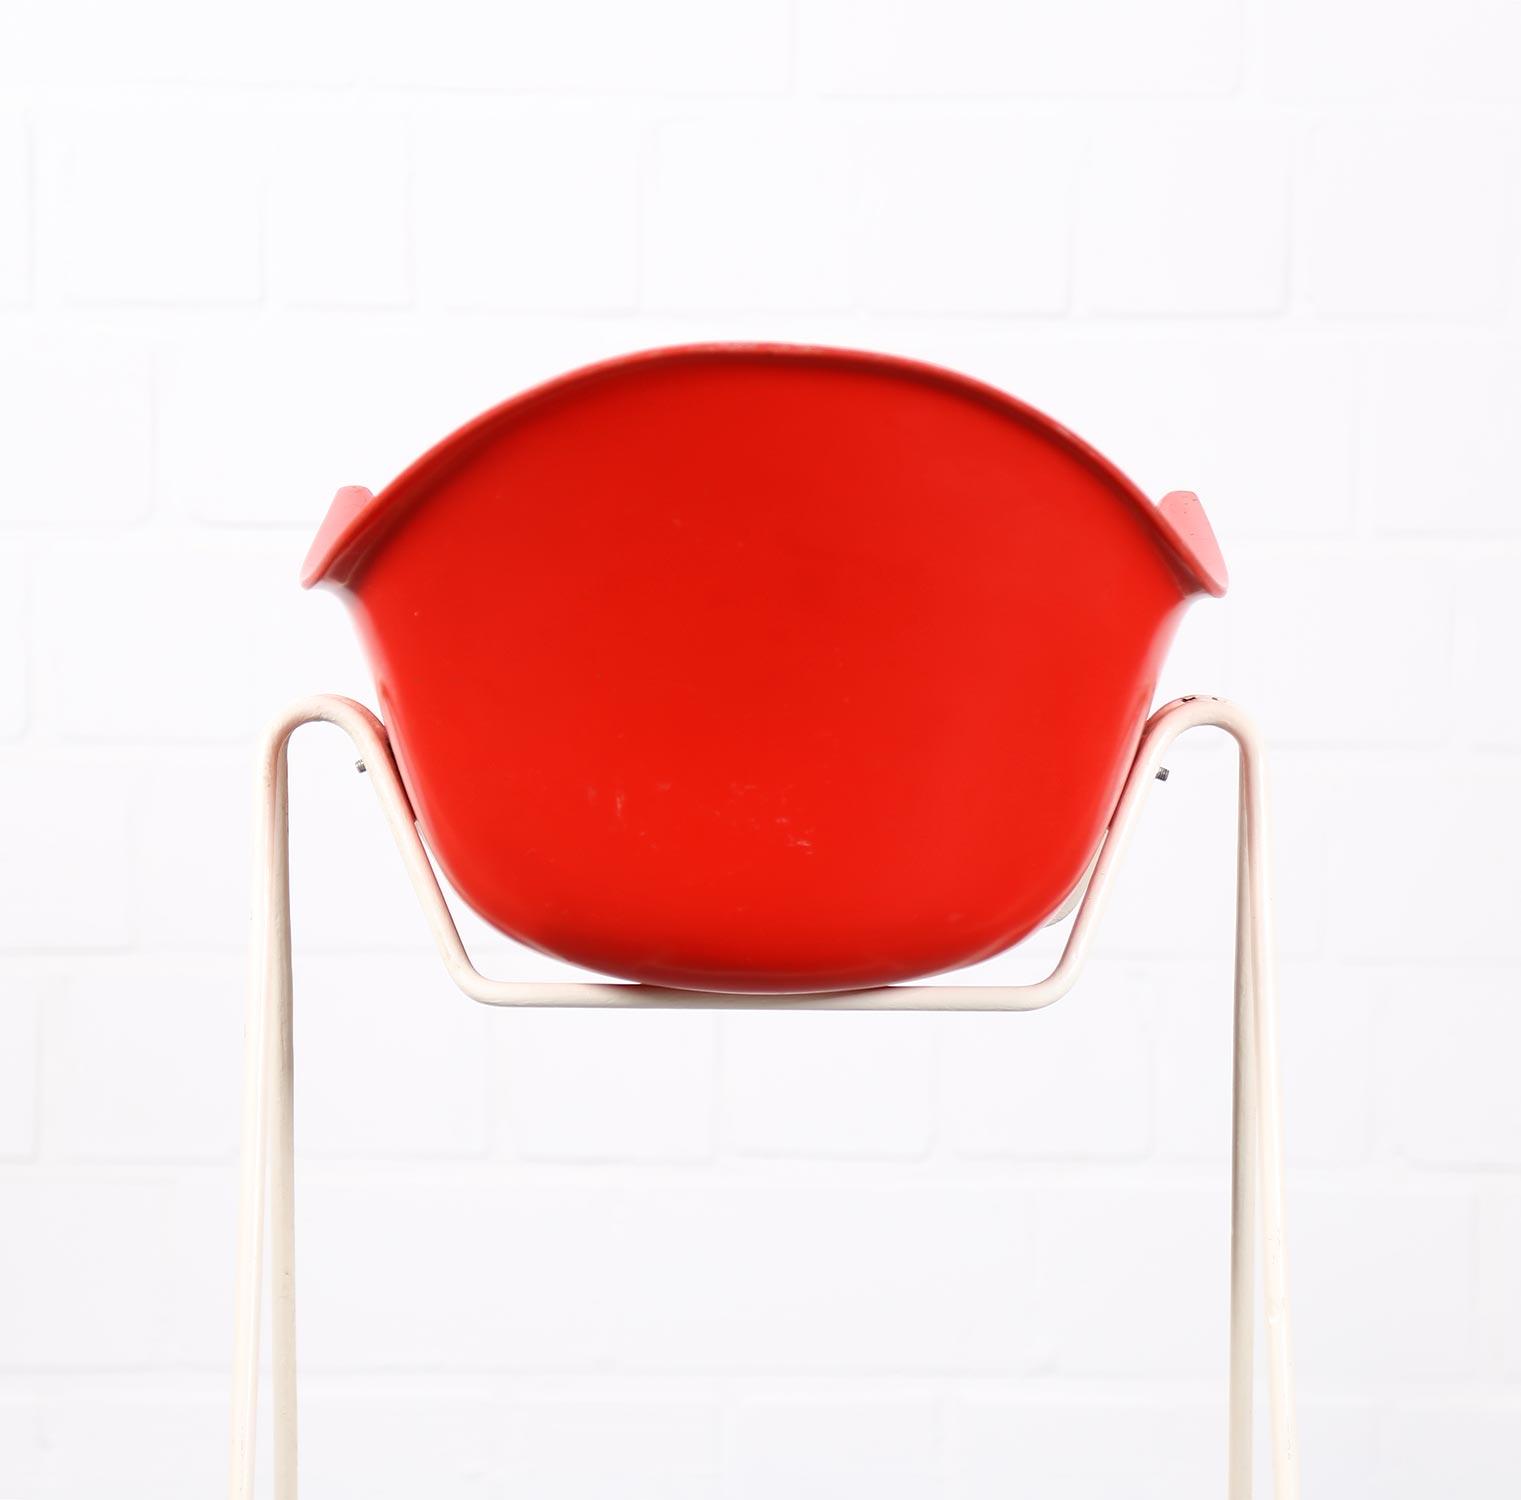 kinder hochstuhl kids chair walter papst wilkhahn 60er. Black Bedroom Furniture Sets. Home Design Ideas